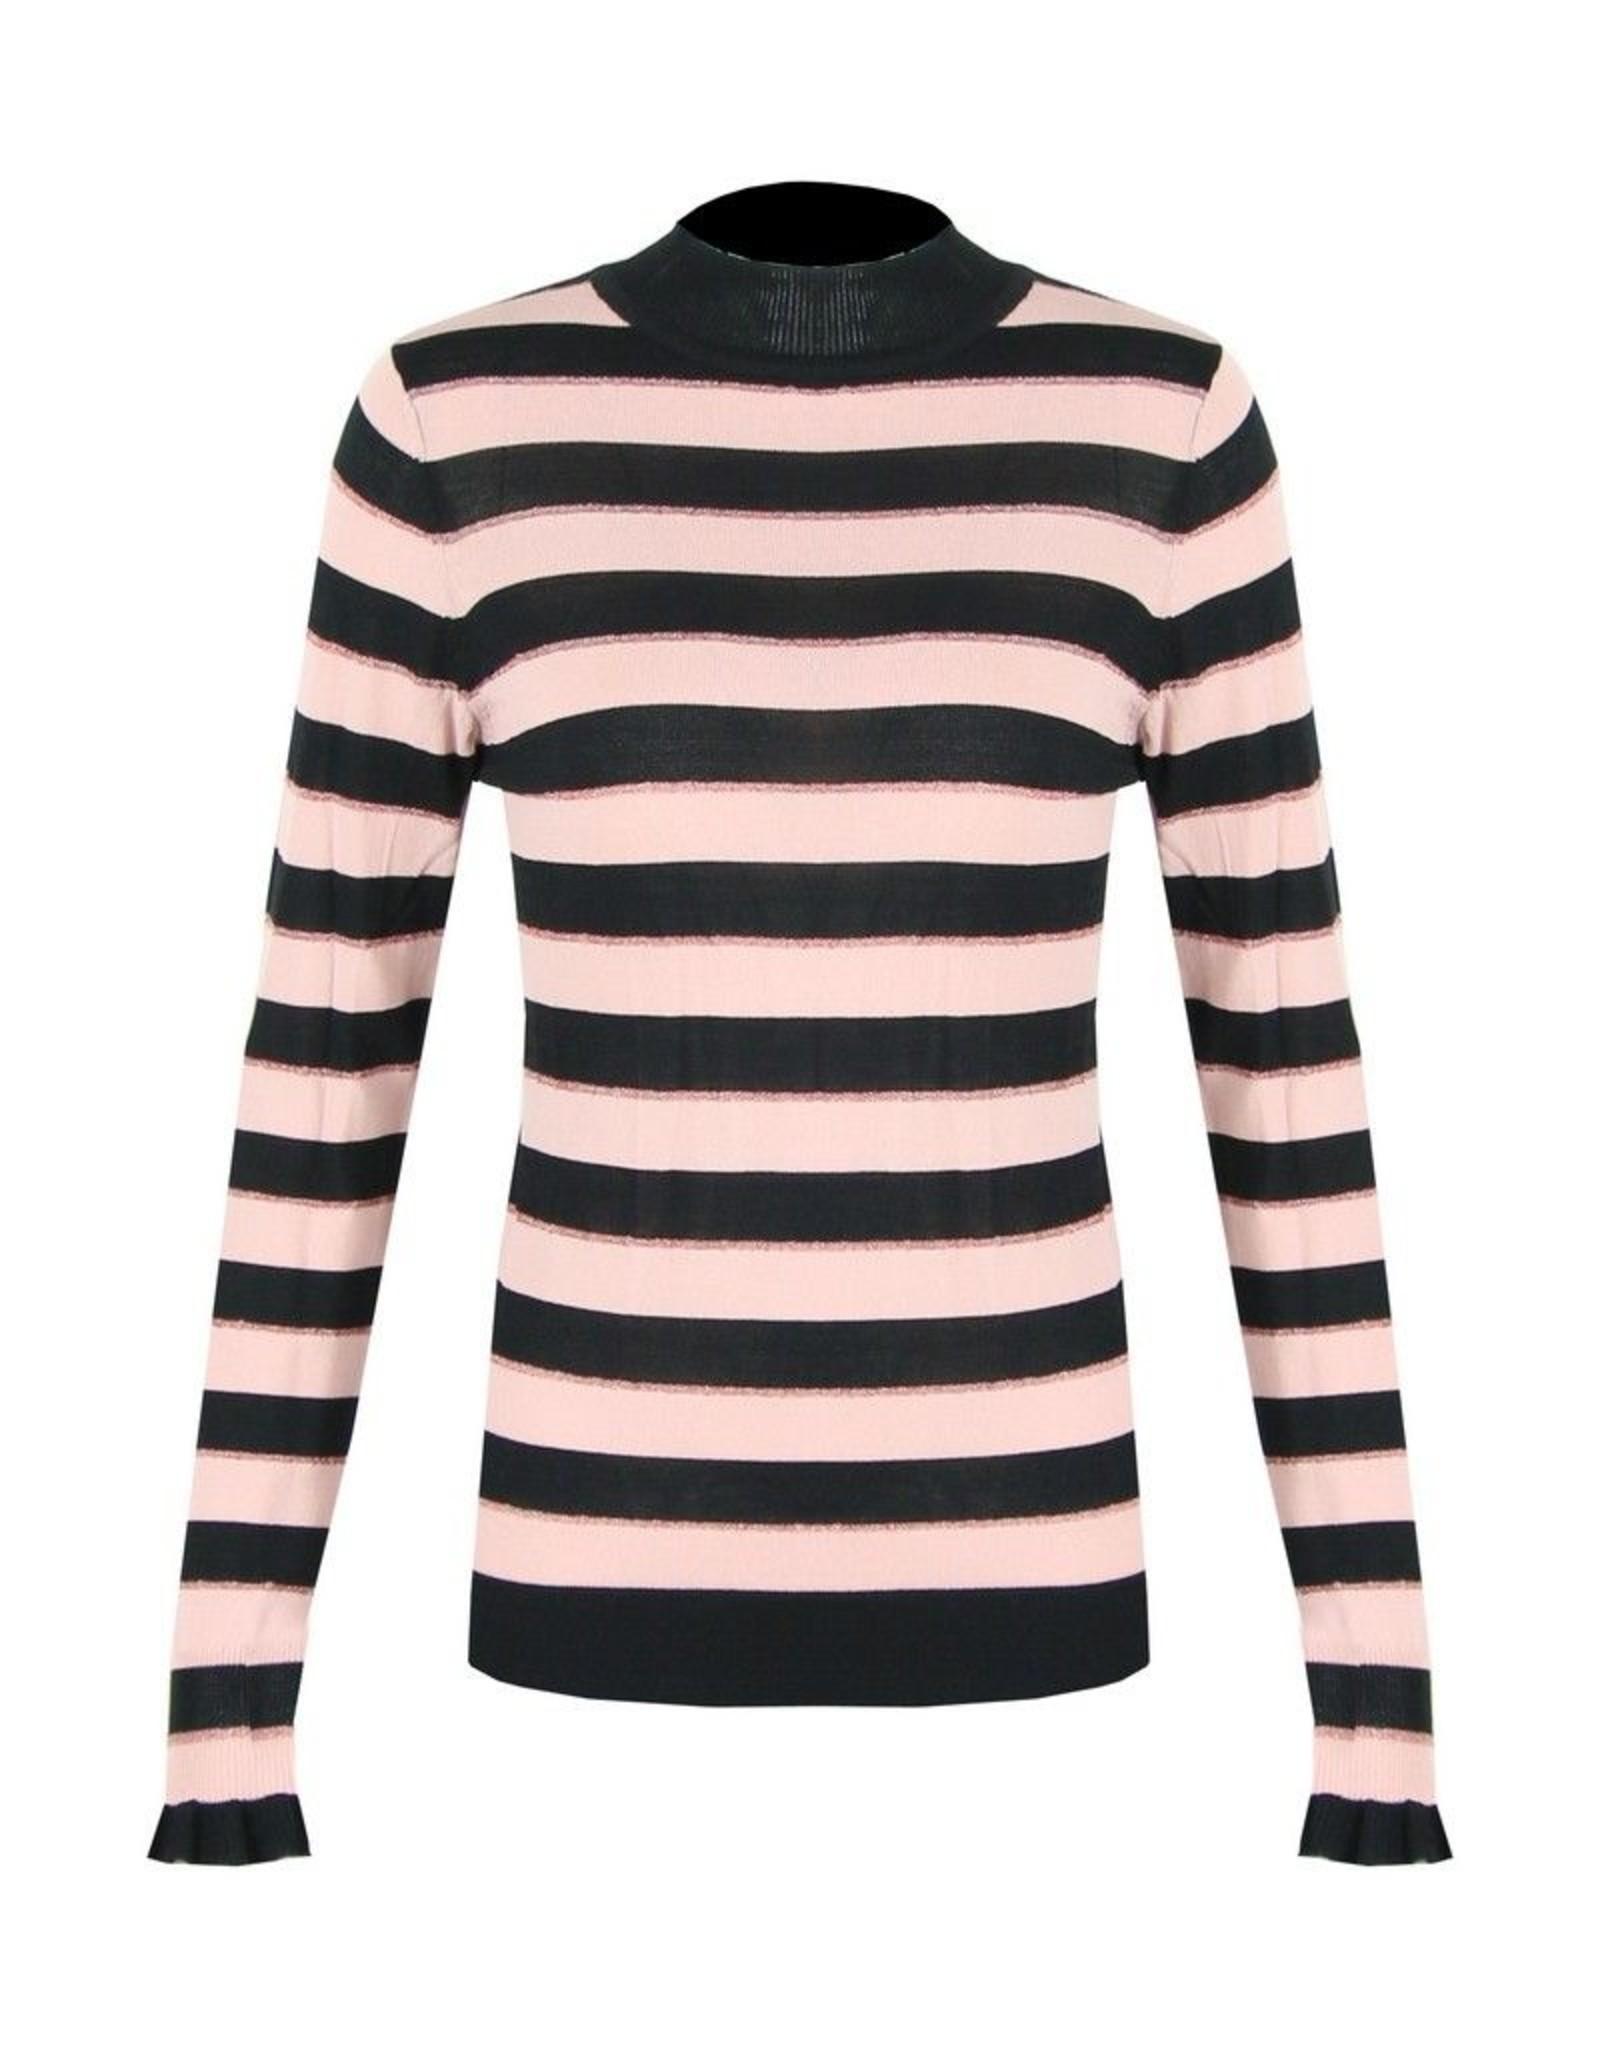 C&S  Sweater Light Pink Striped